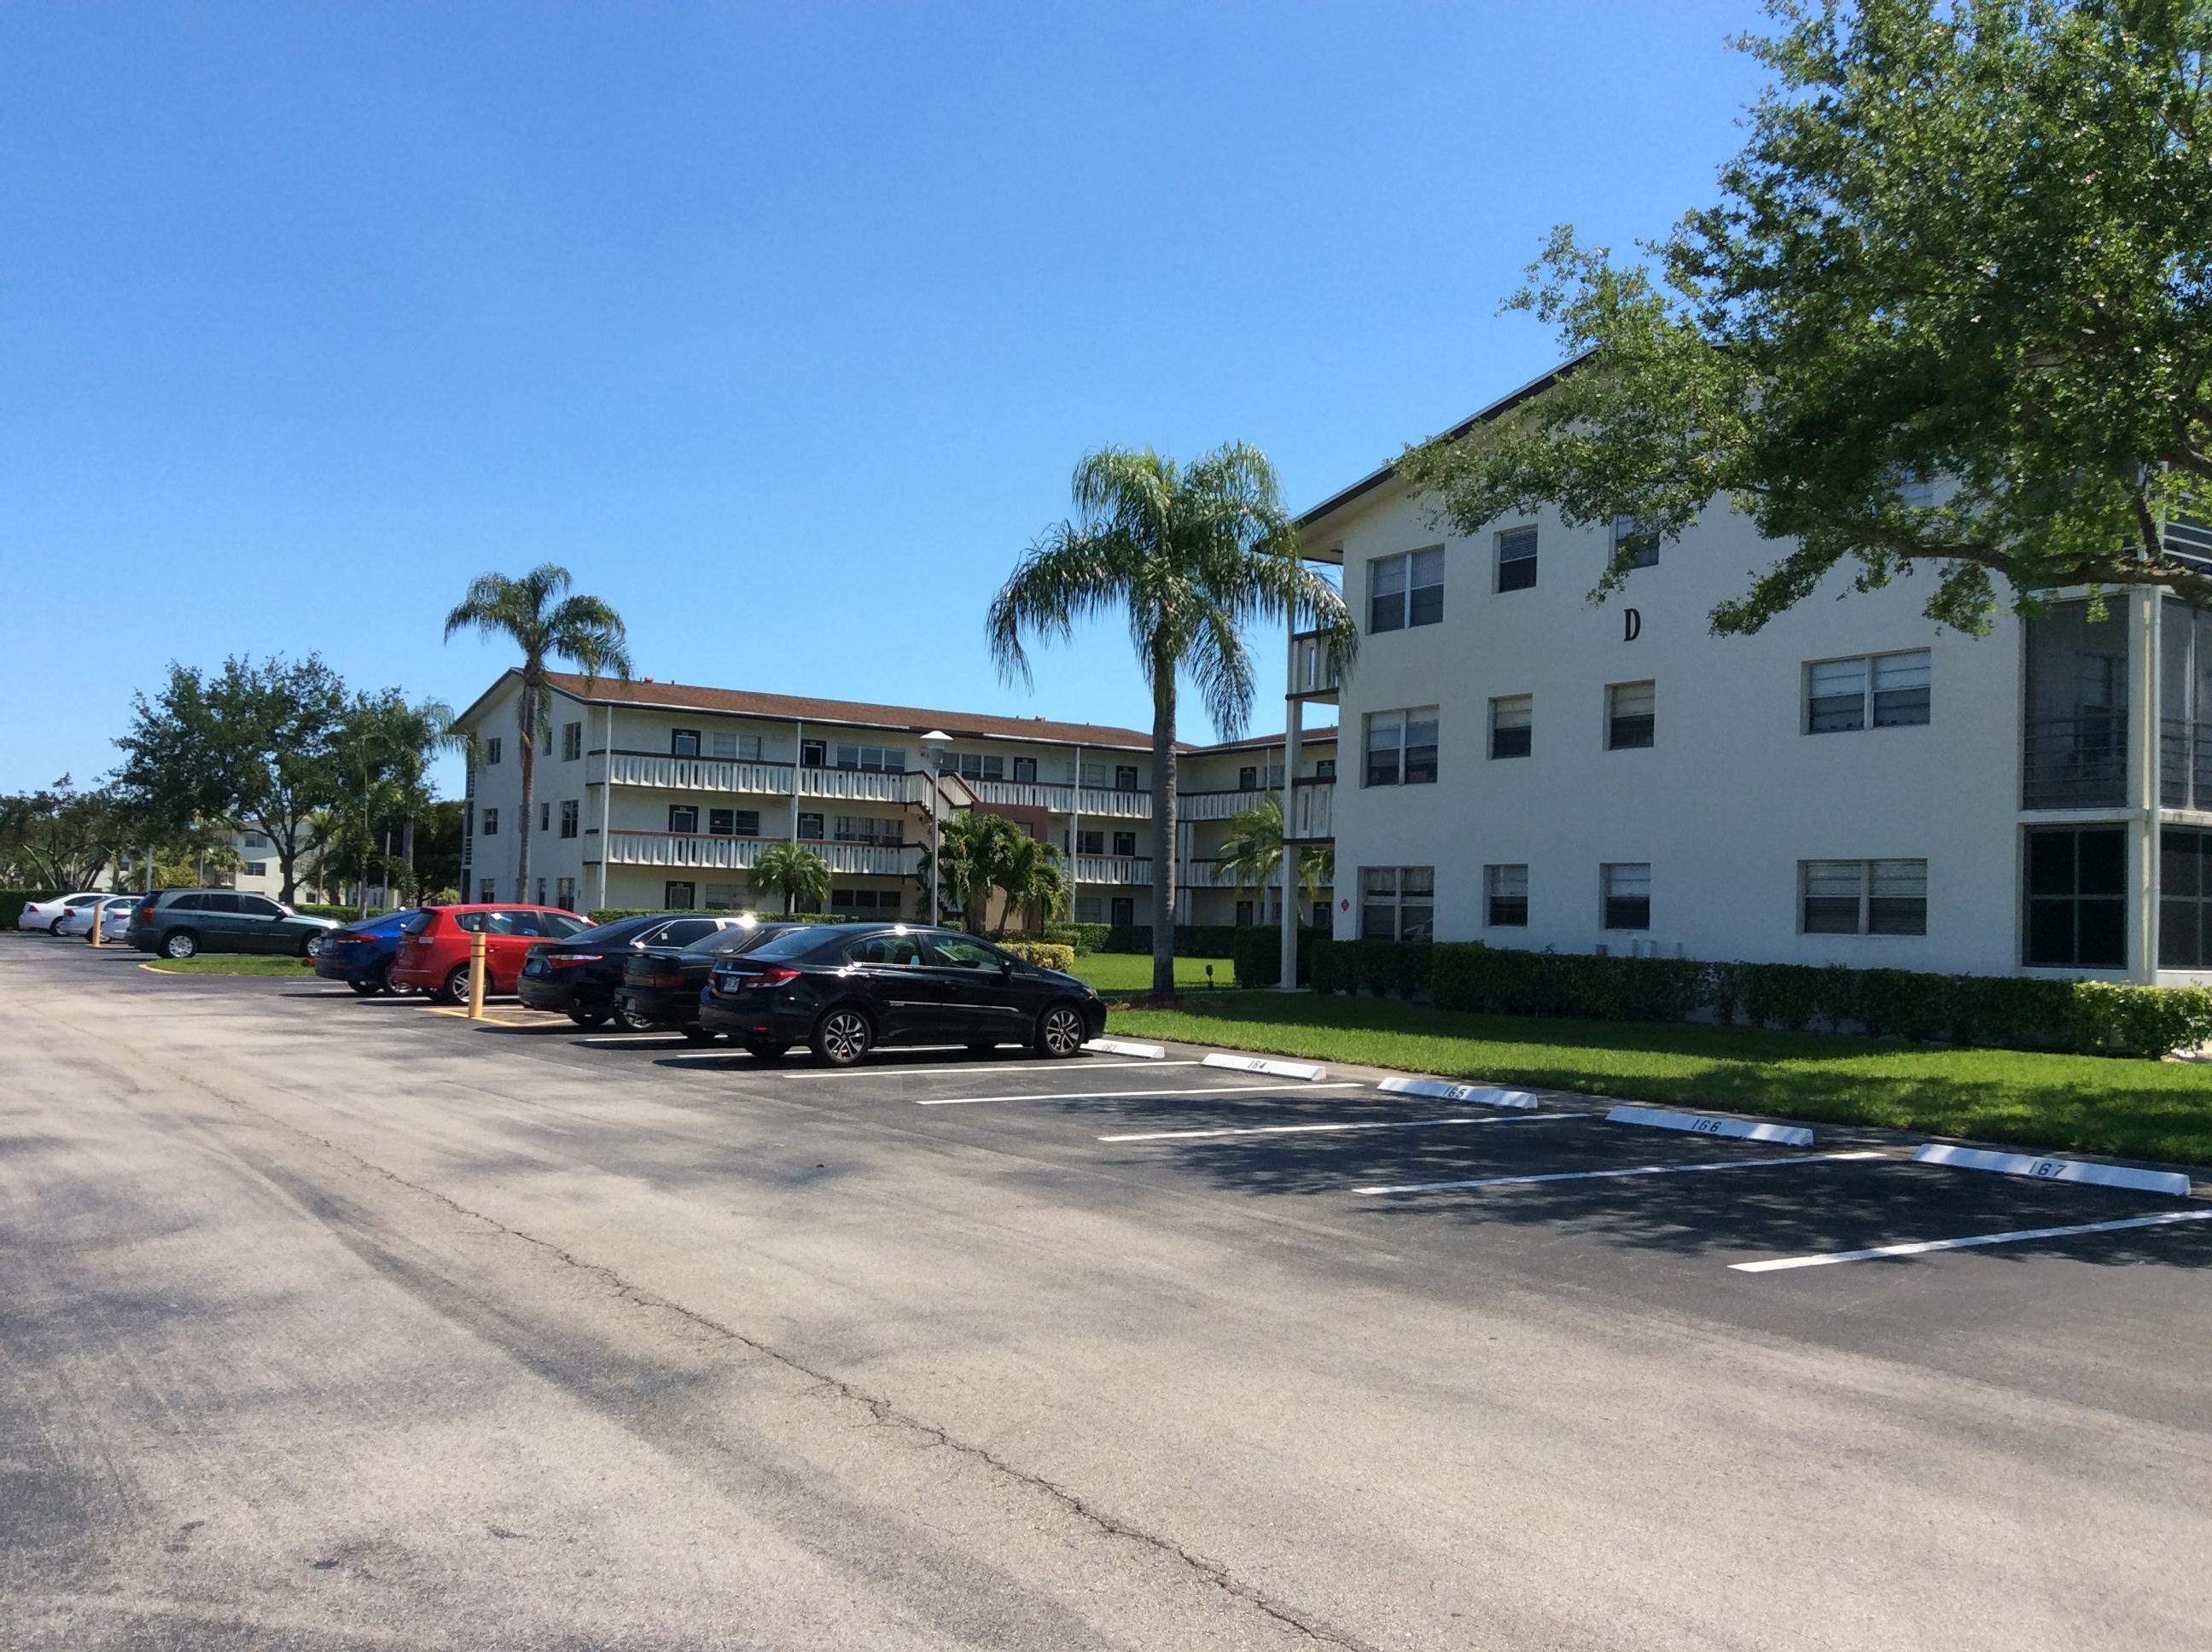 Home for sale in Century Village Boca Raton Florida